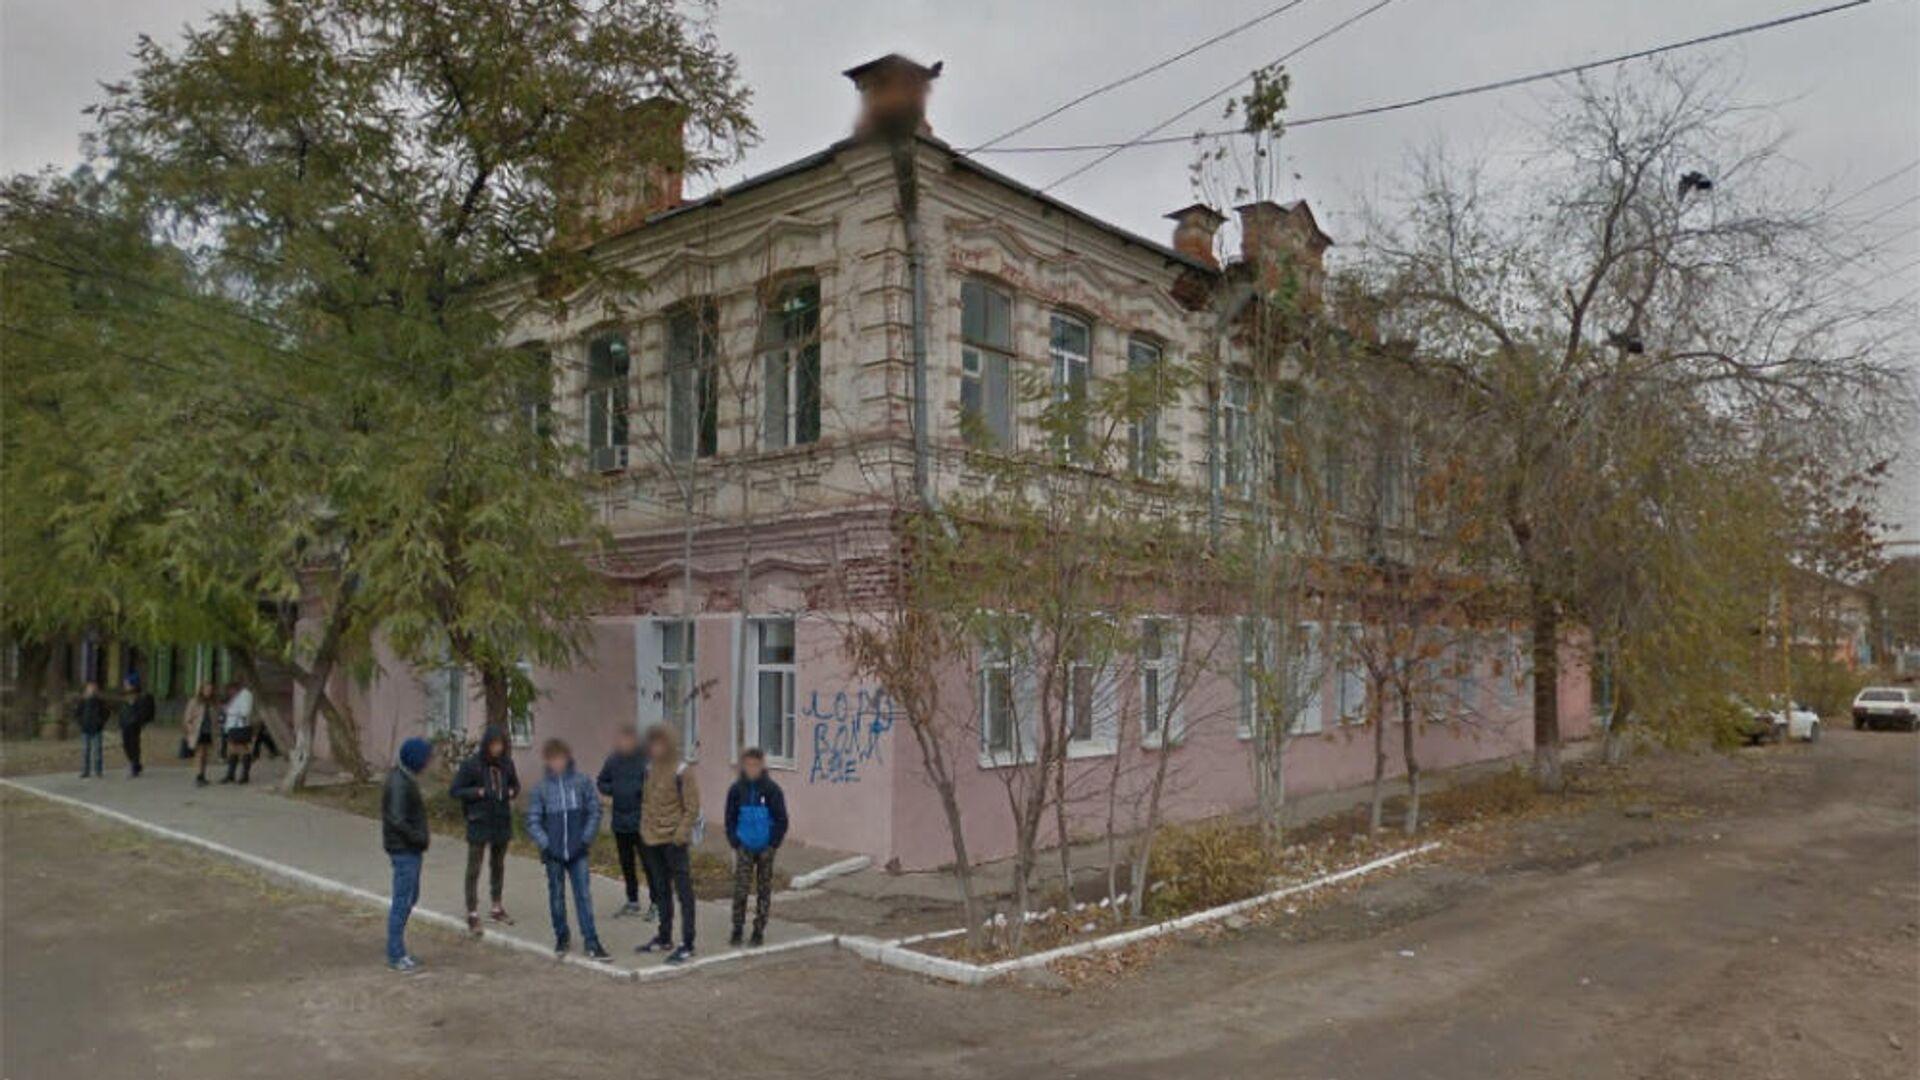 Школа №8 - РИА Новости, 1920, 21.07.2020